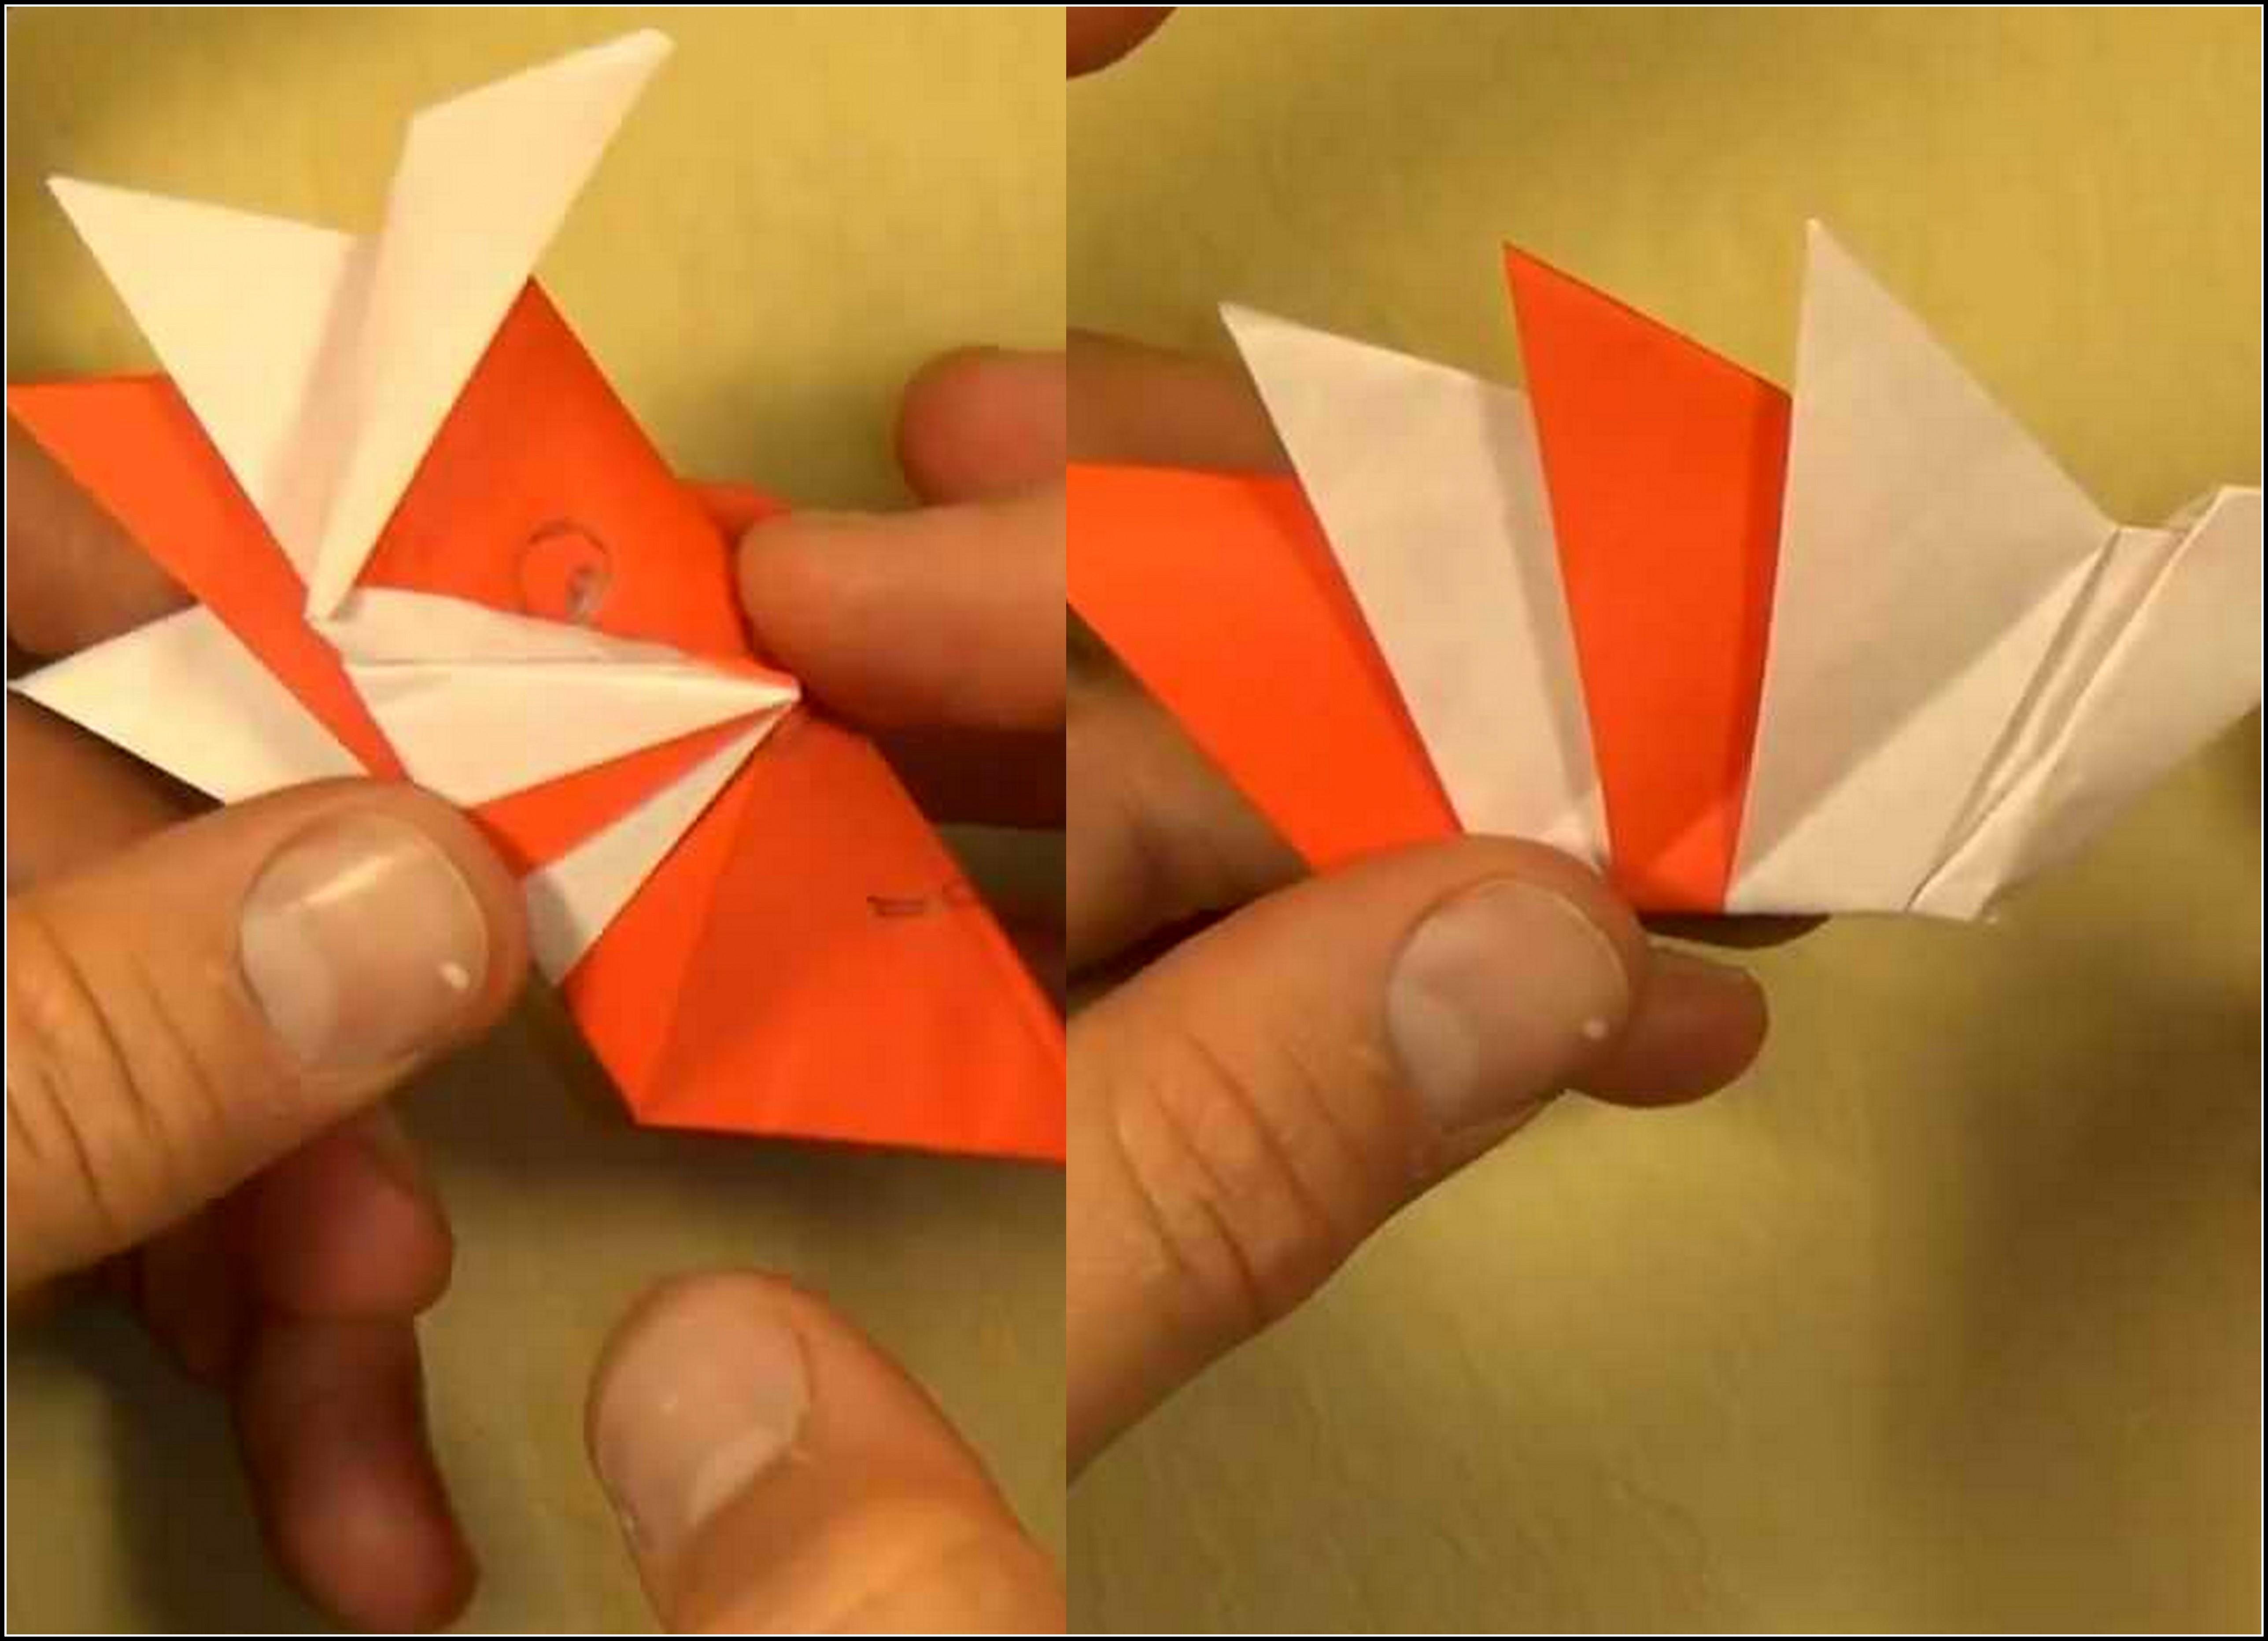 Пружинка оригами от Джефа Бейнона (Jeff Beynon)